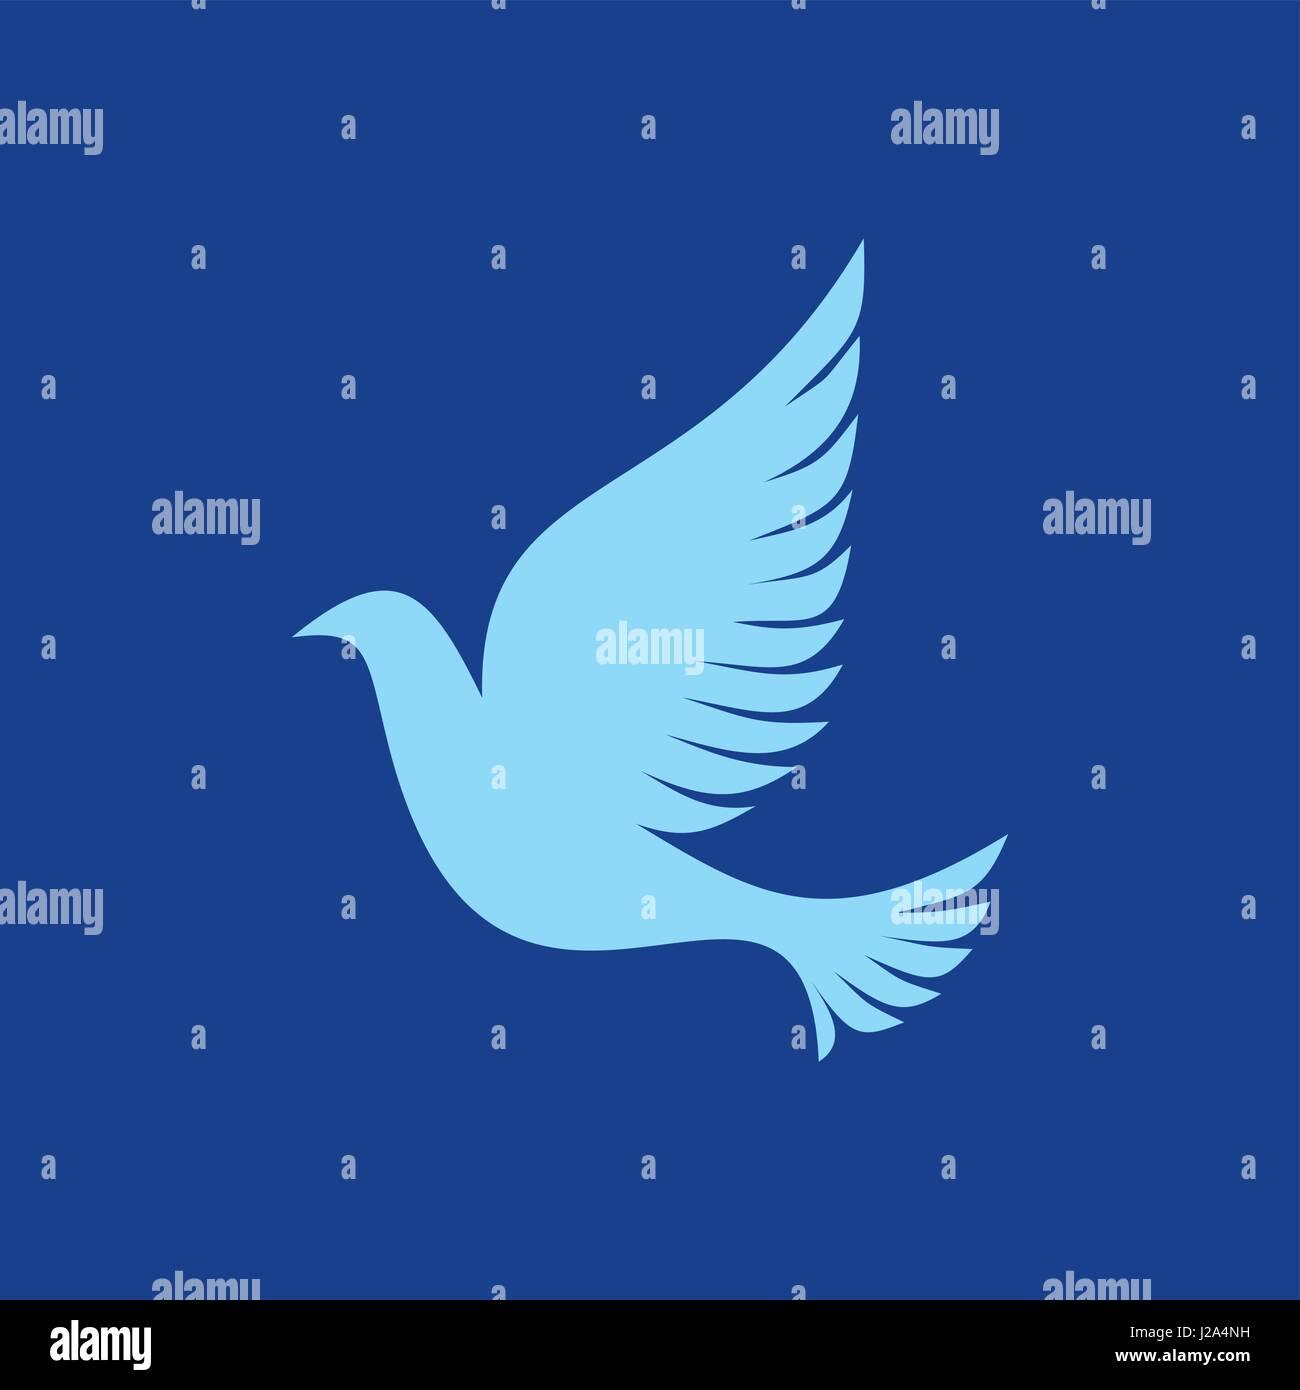 Dove a symbol of the holy spirit of god stock vector art dove a symbol of the holy spirit of god biocorpaavc